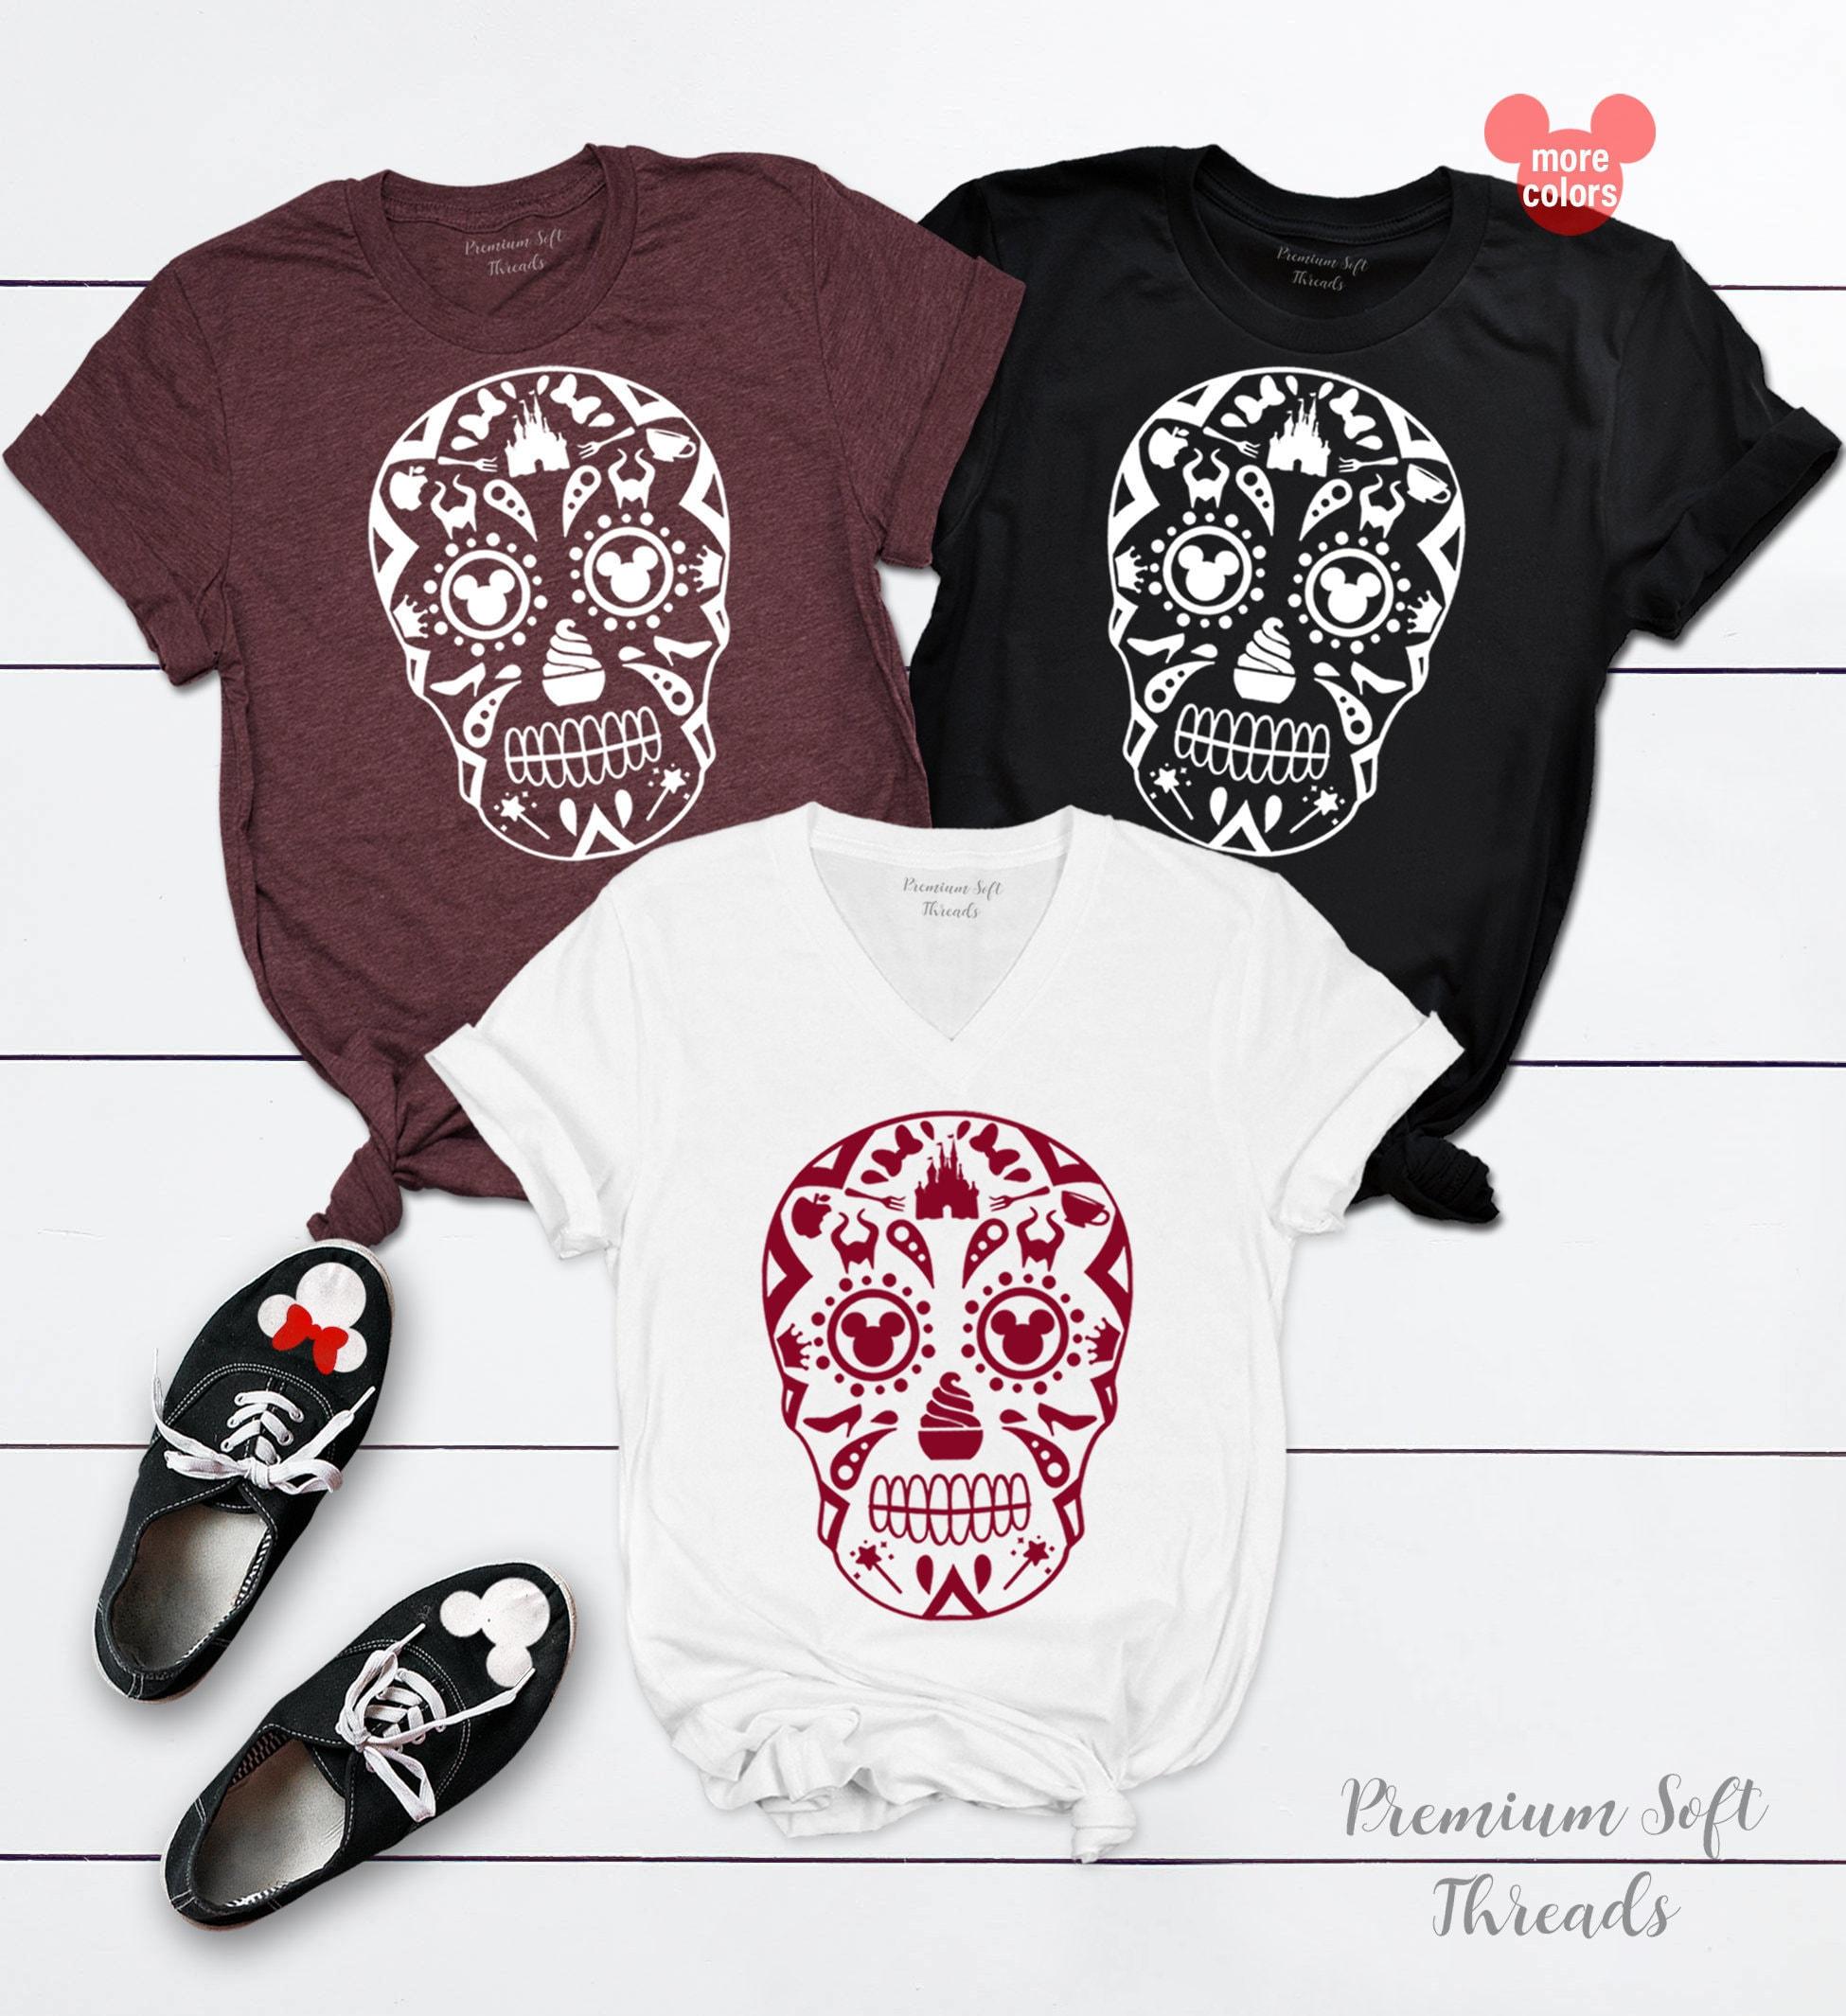 Disney Shirts, Disney Sugar Skull Shirts, Mickie Mouse Shirts, Family  Disney Shirts, Family Disney T-shirt, Matching Family Disney T-shirts